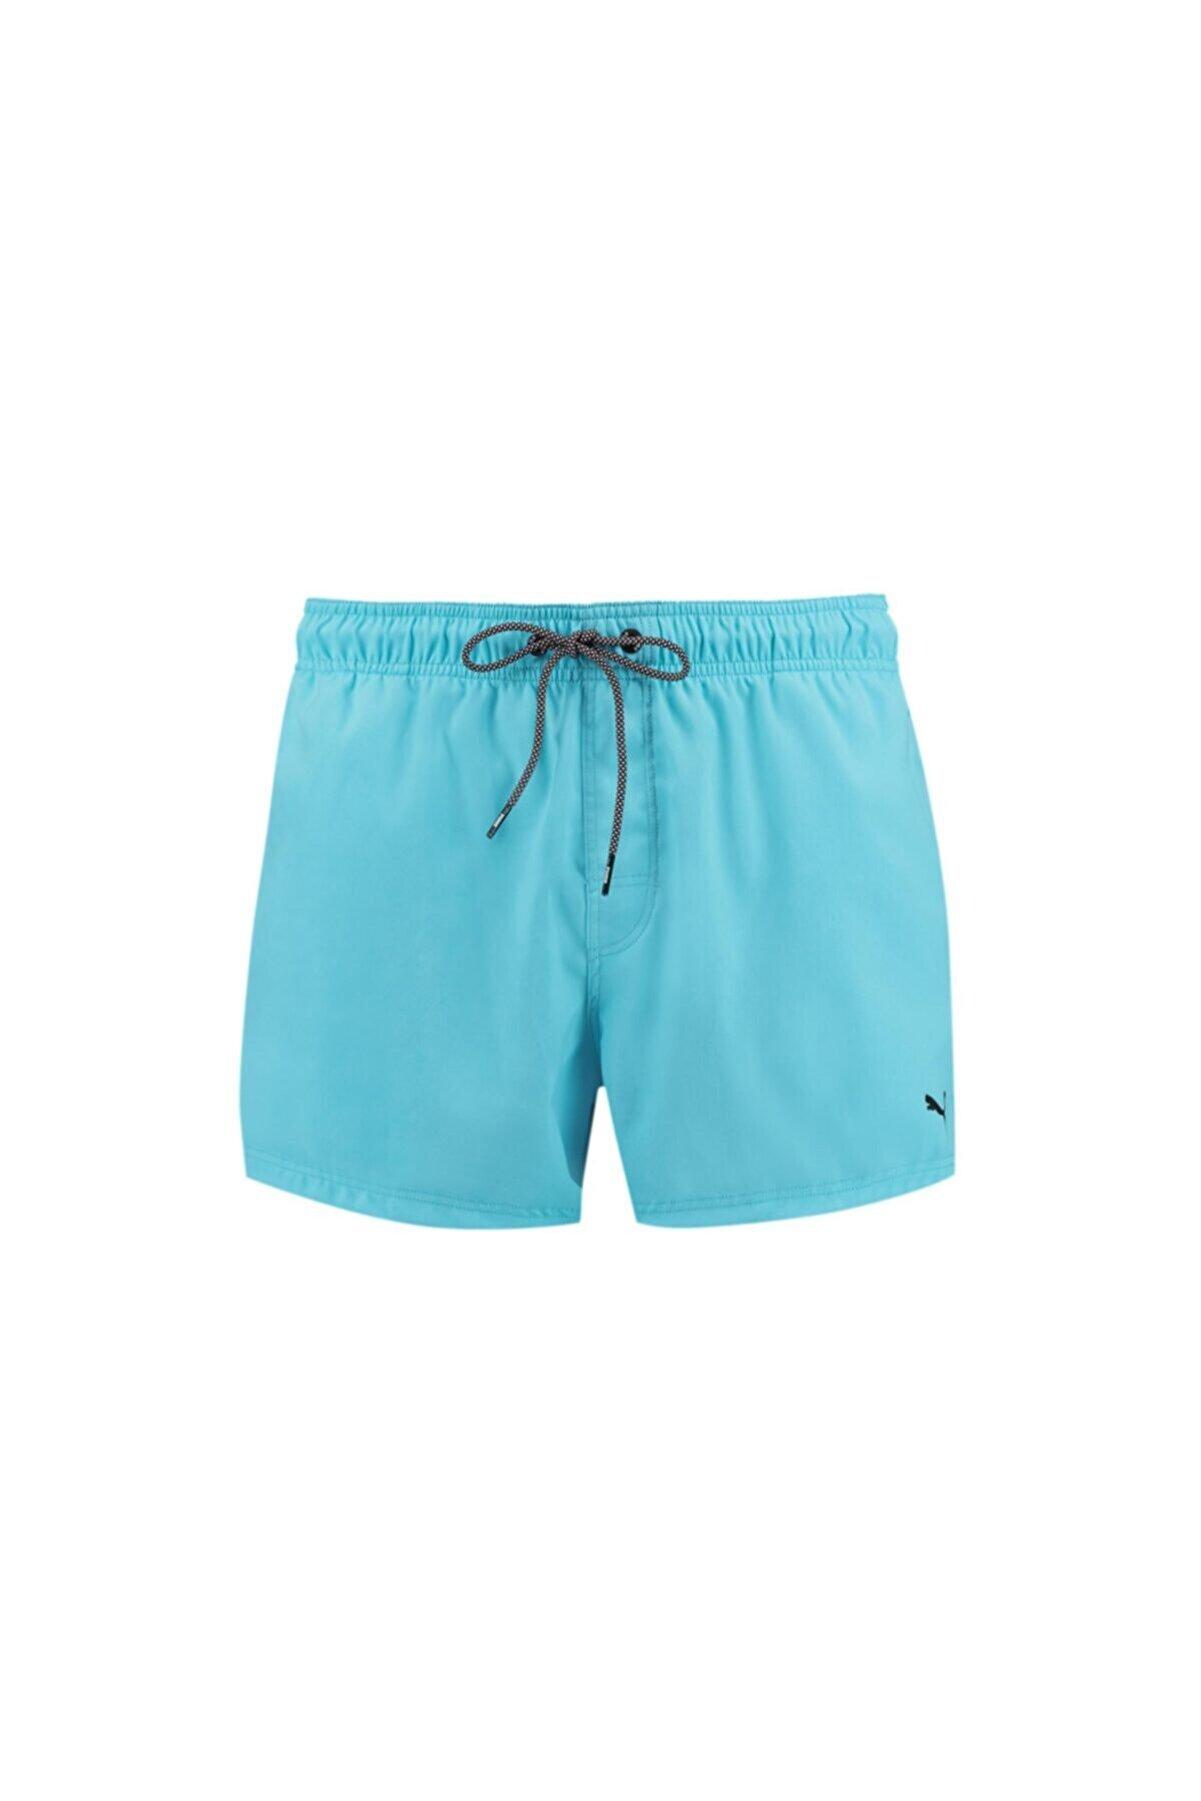 Puma Swim Erkek Şort - 90765806